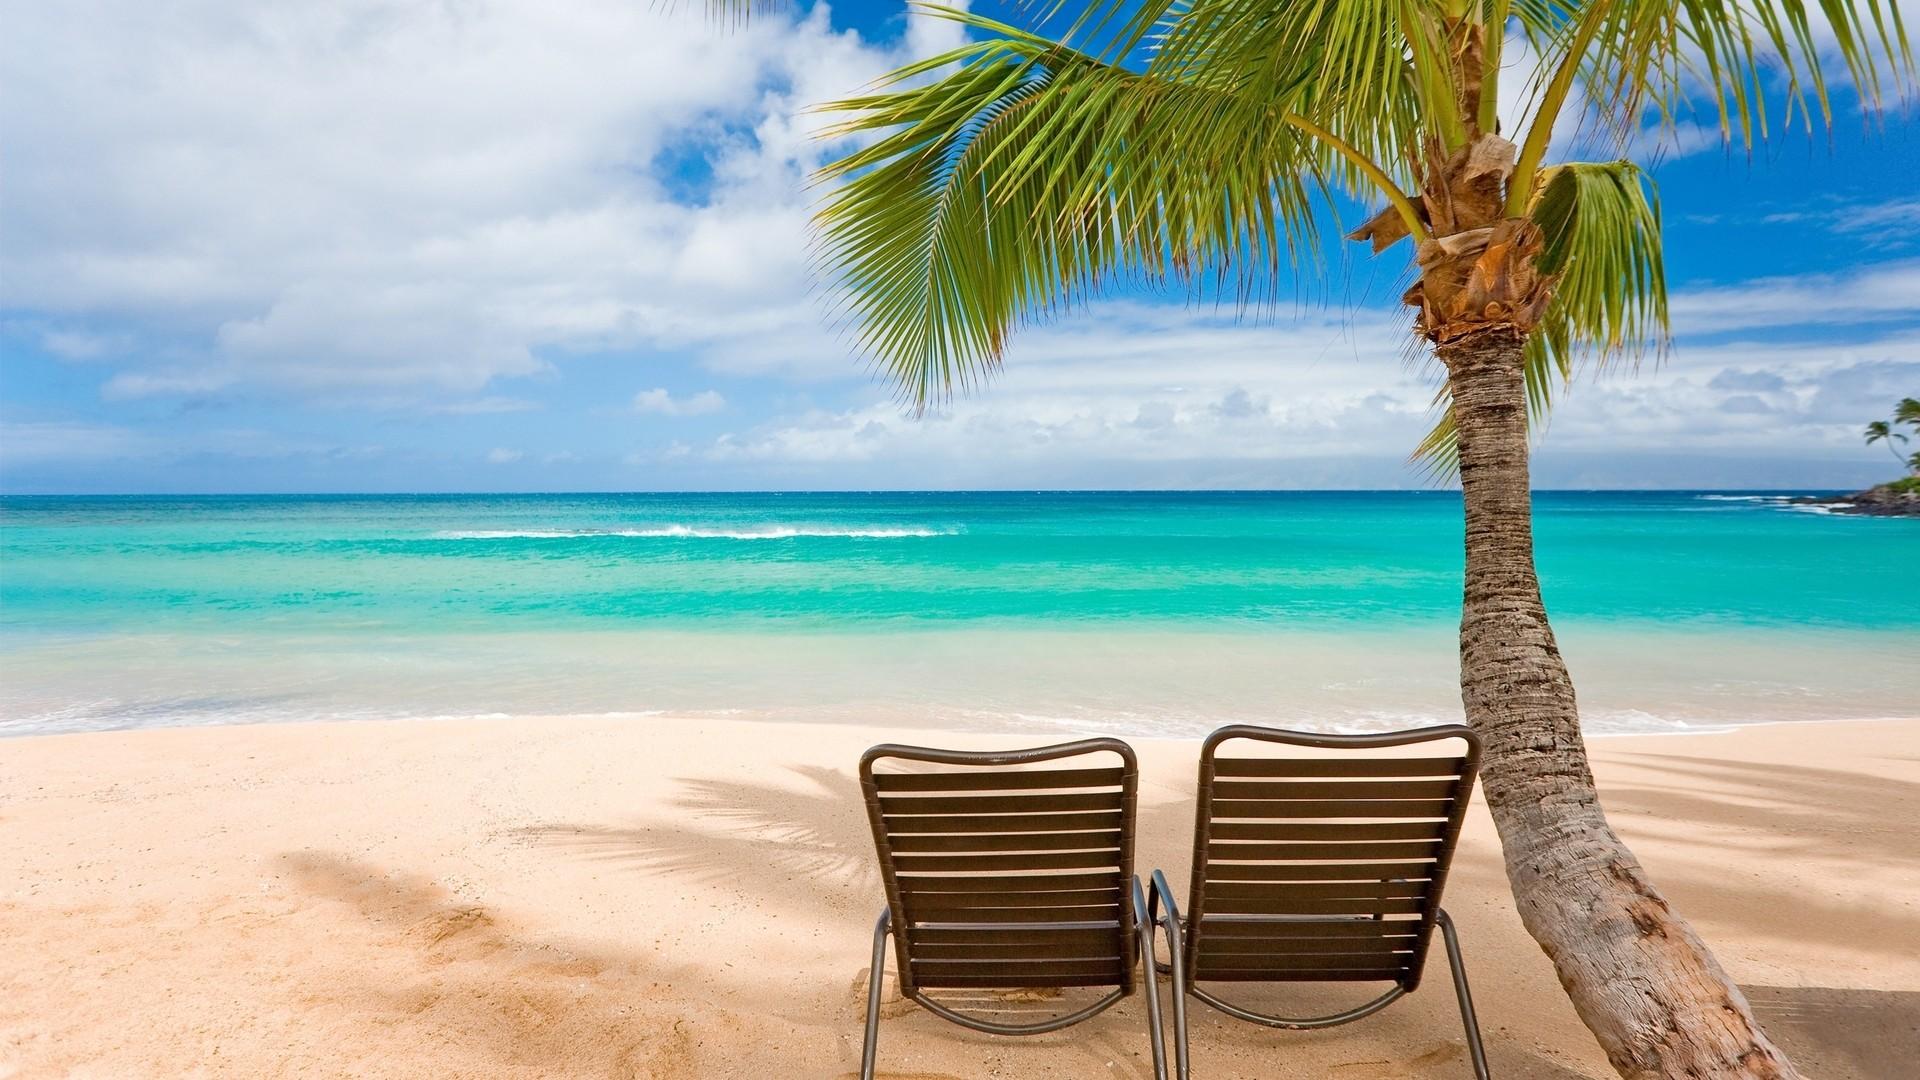 Beautiful Sea View Desktop Backgrounds